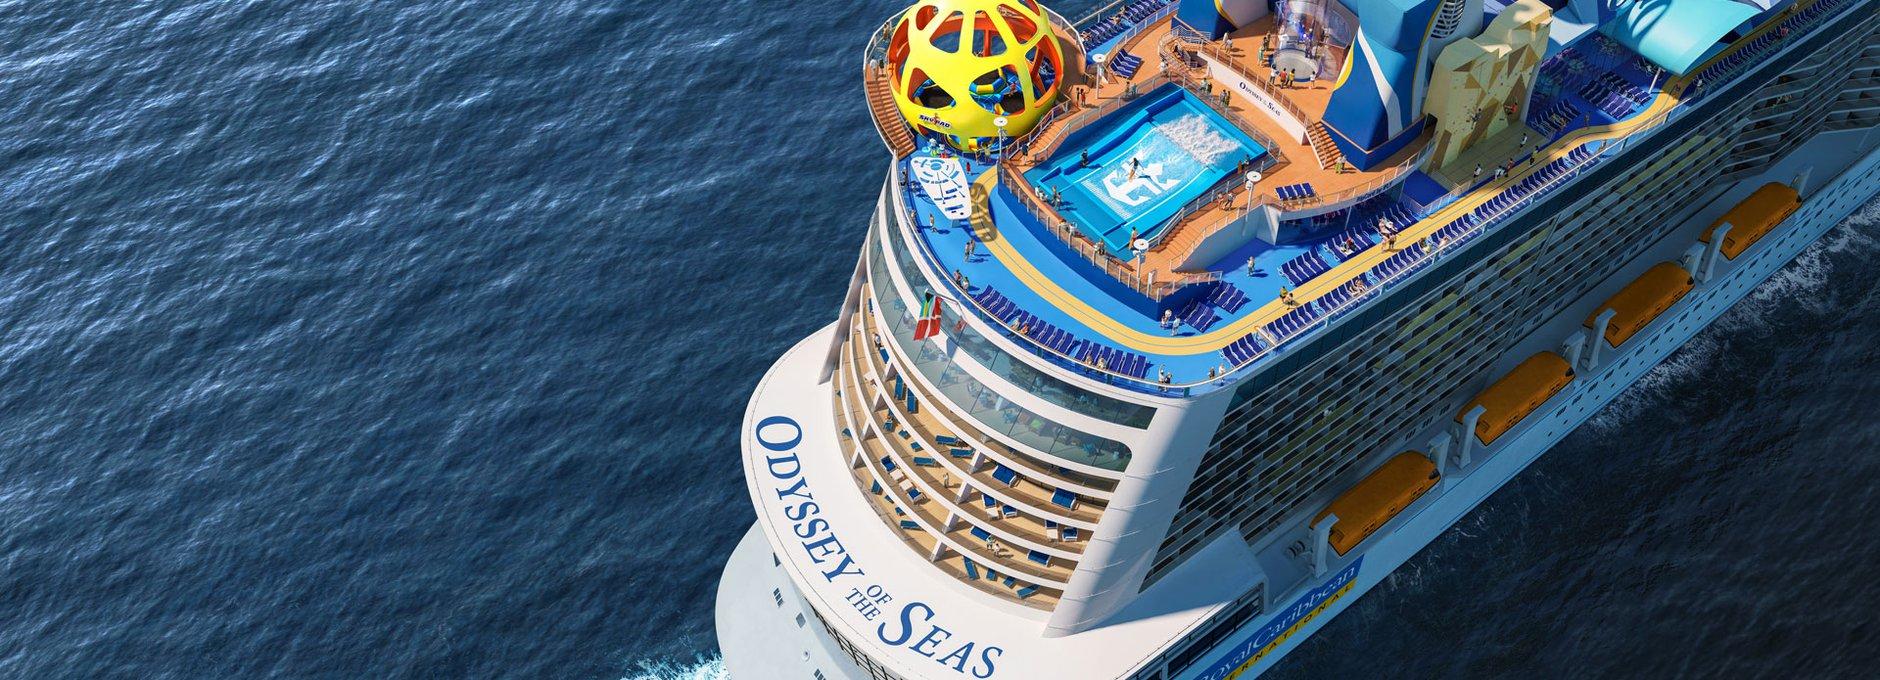 Royal Caribbean Odyssey-of-the-Seas-aerial-view.jpg